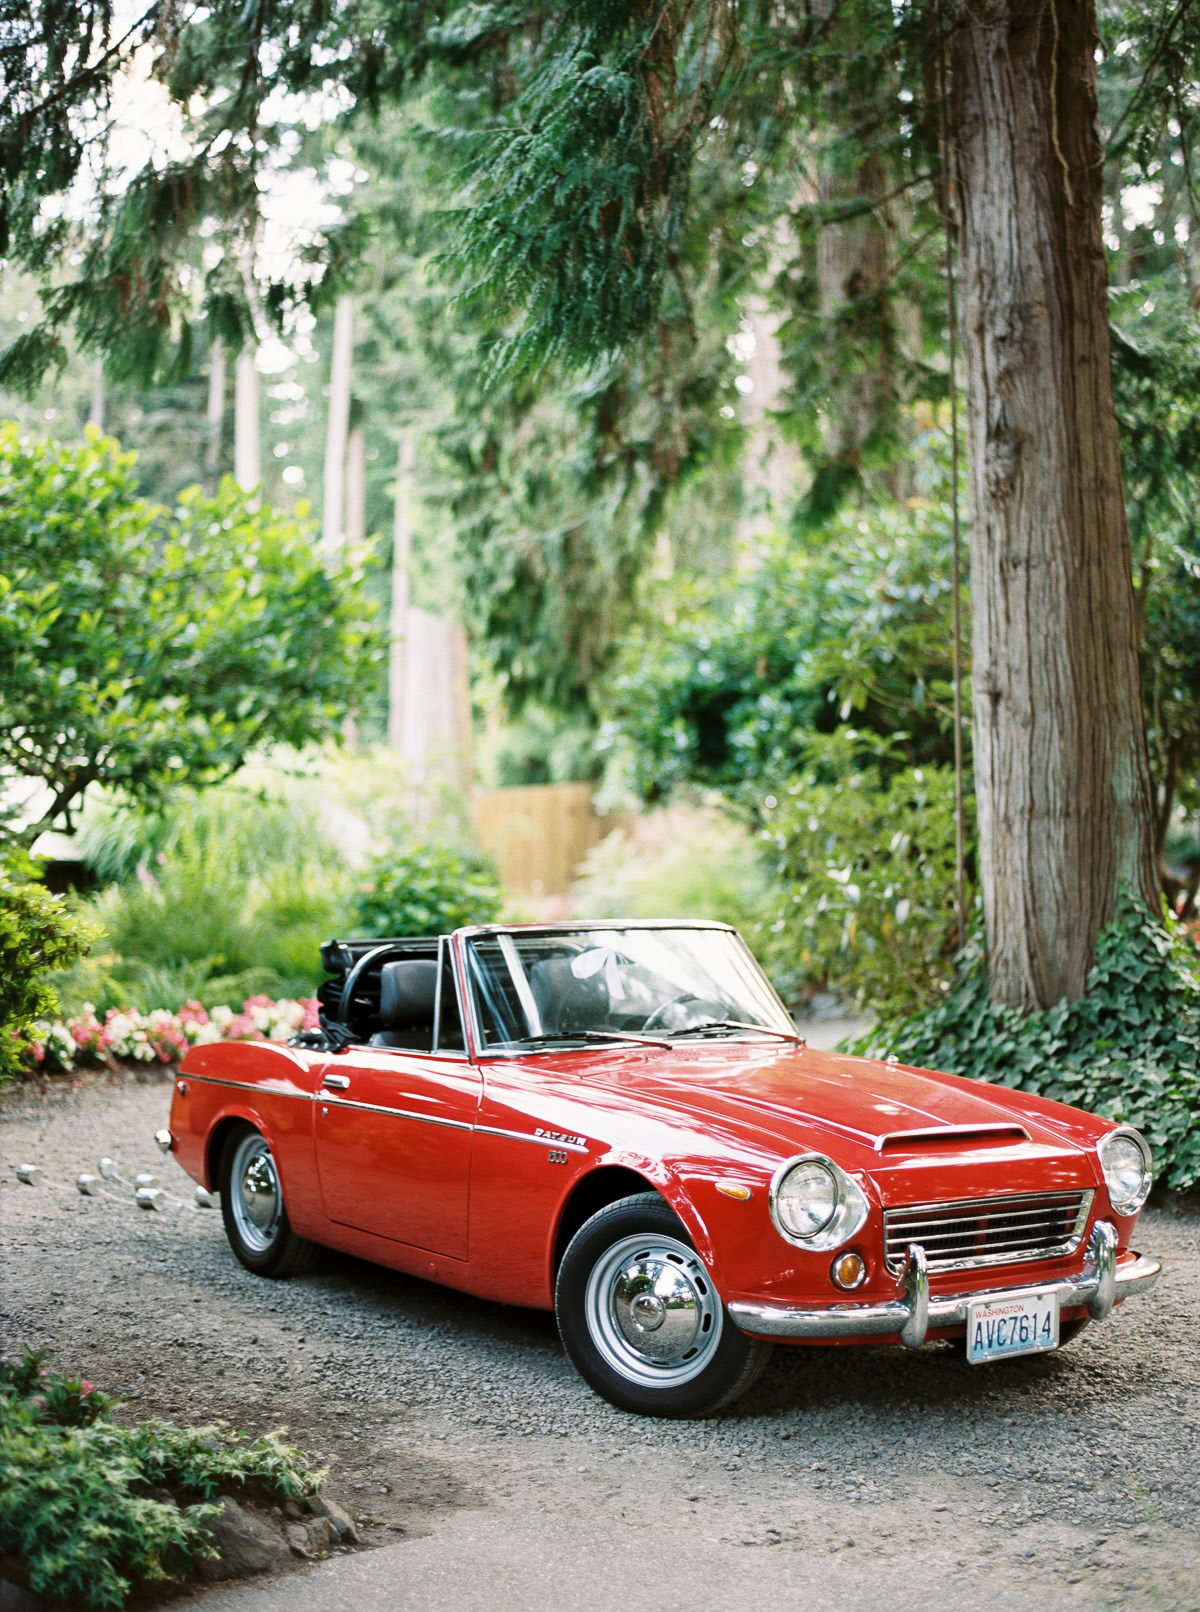 Vintage getaway car at an elegant Kiana Lodge wedding